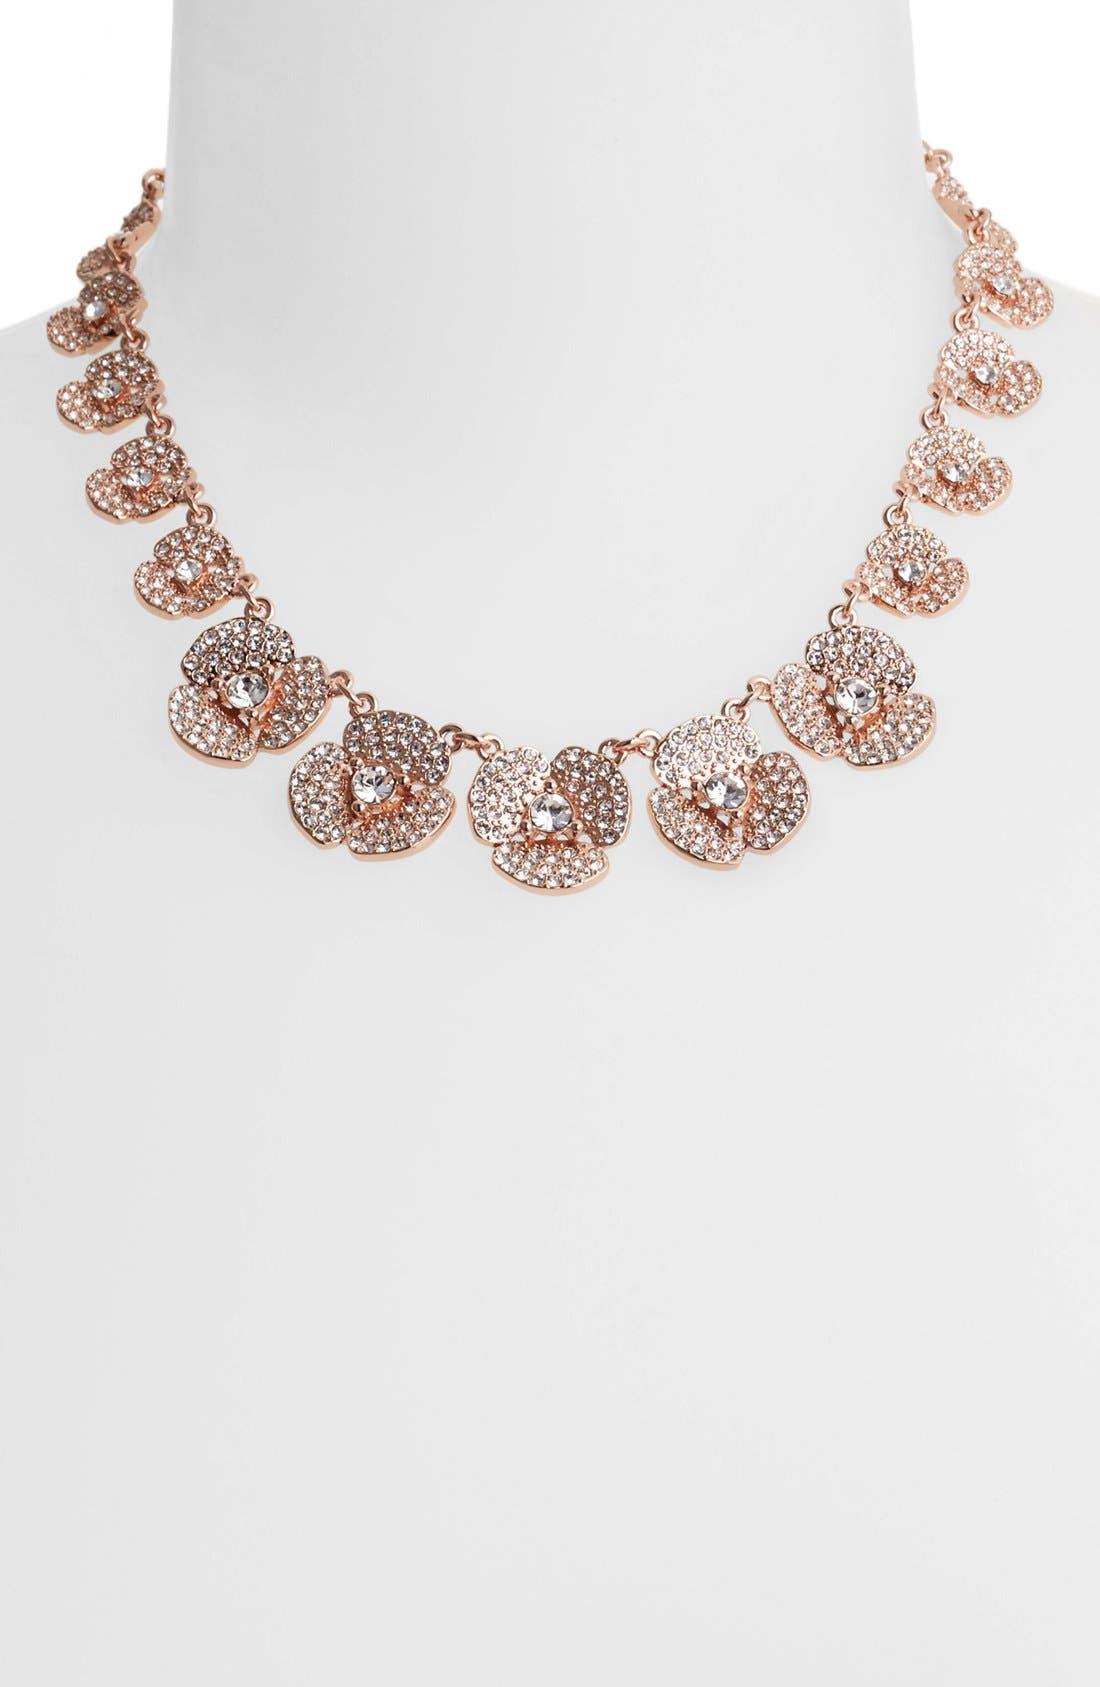 Alternate Image 1 Selected - kate spade new york 'disco pansy' pavé flower collar necklace